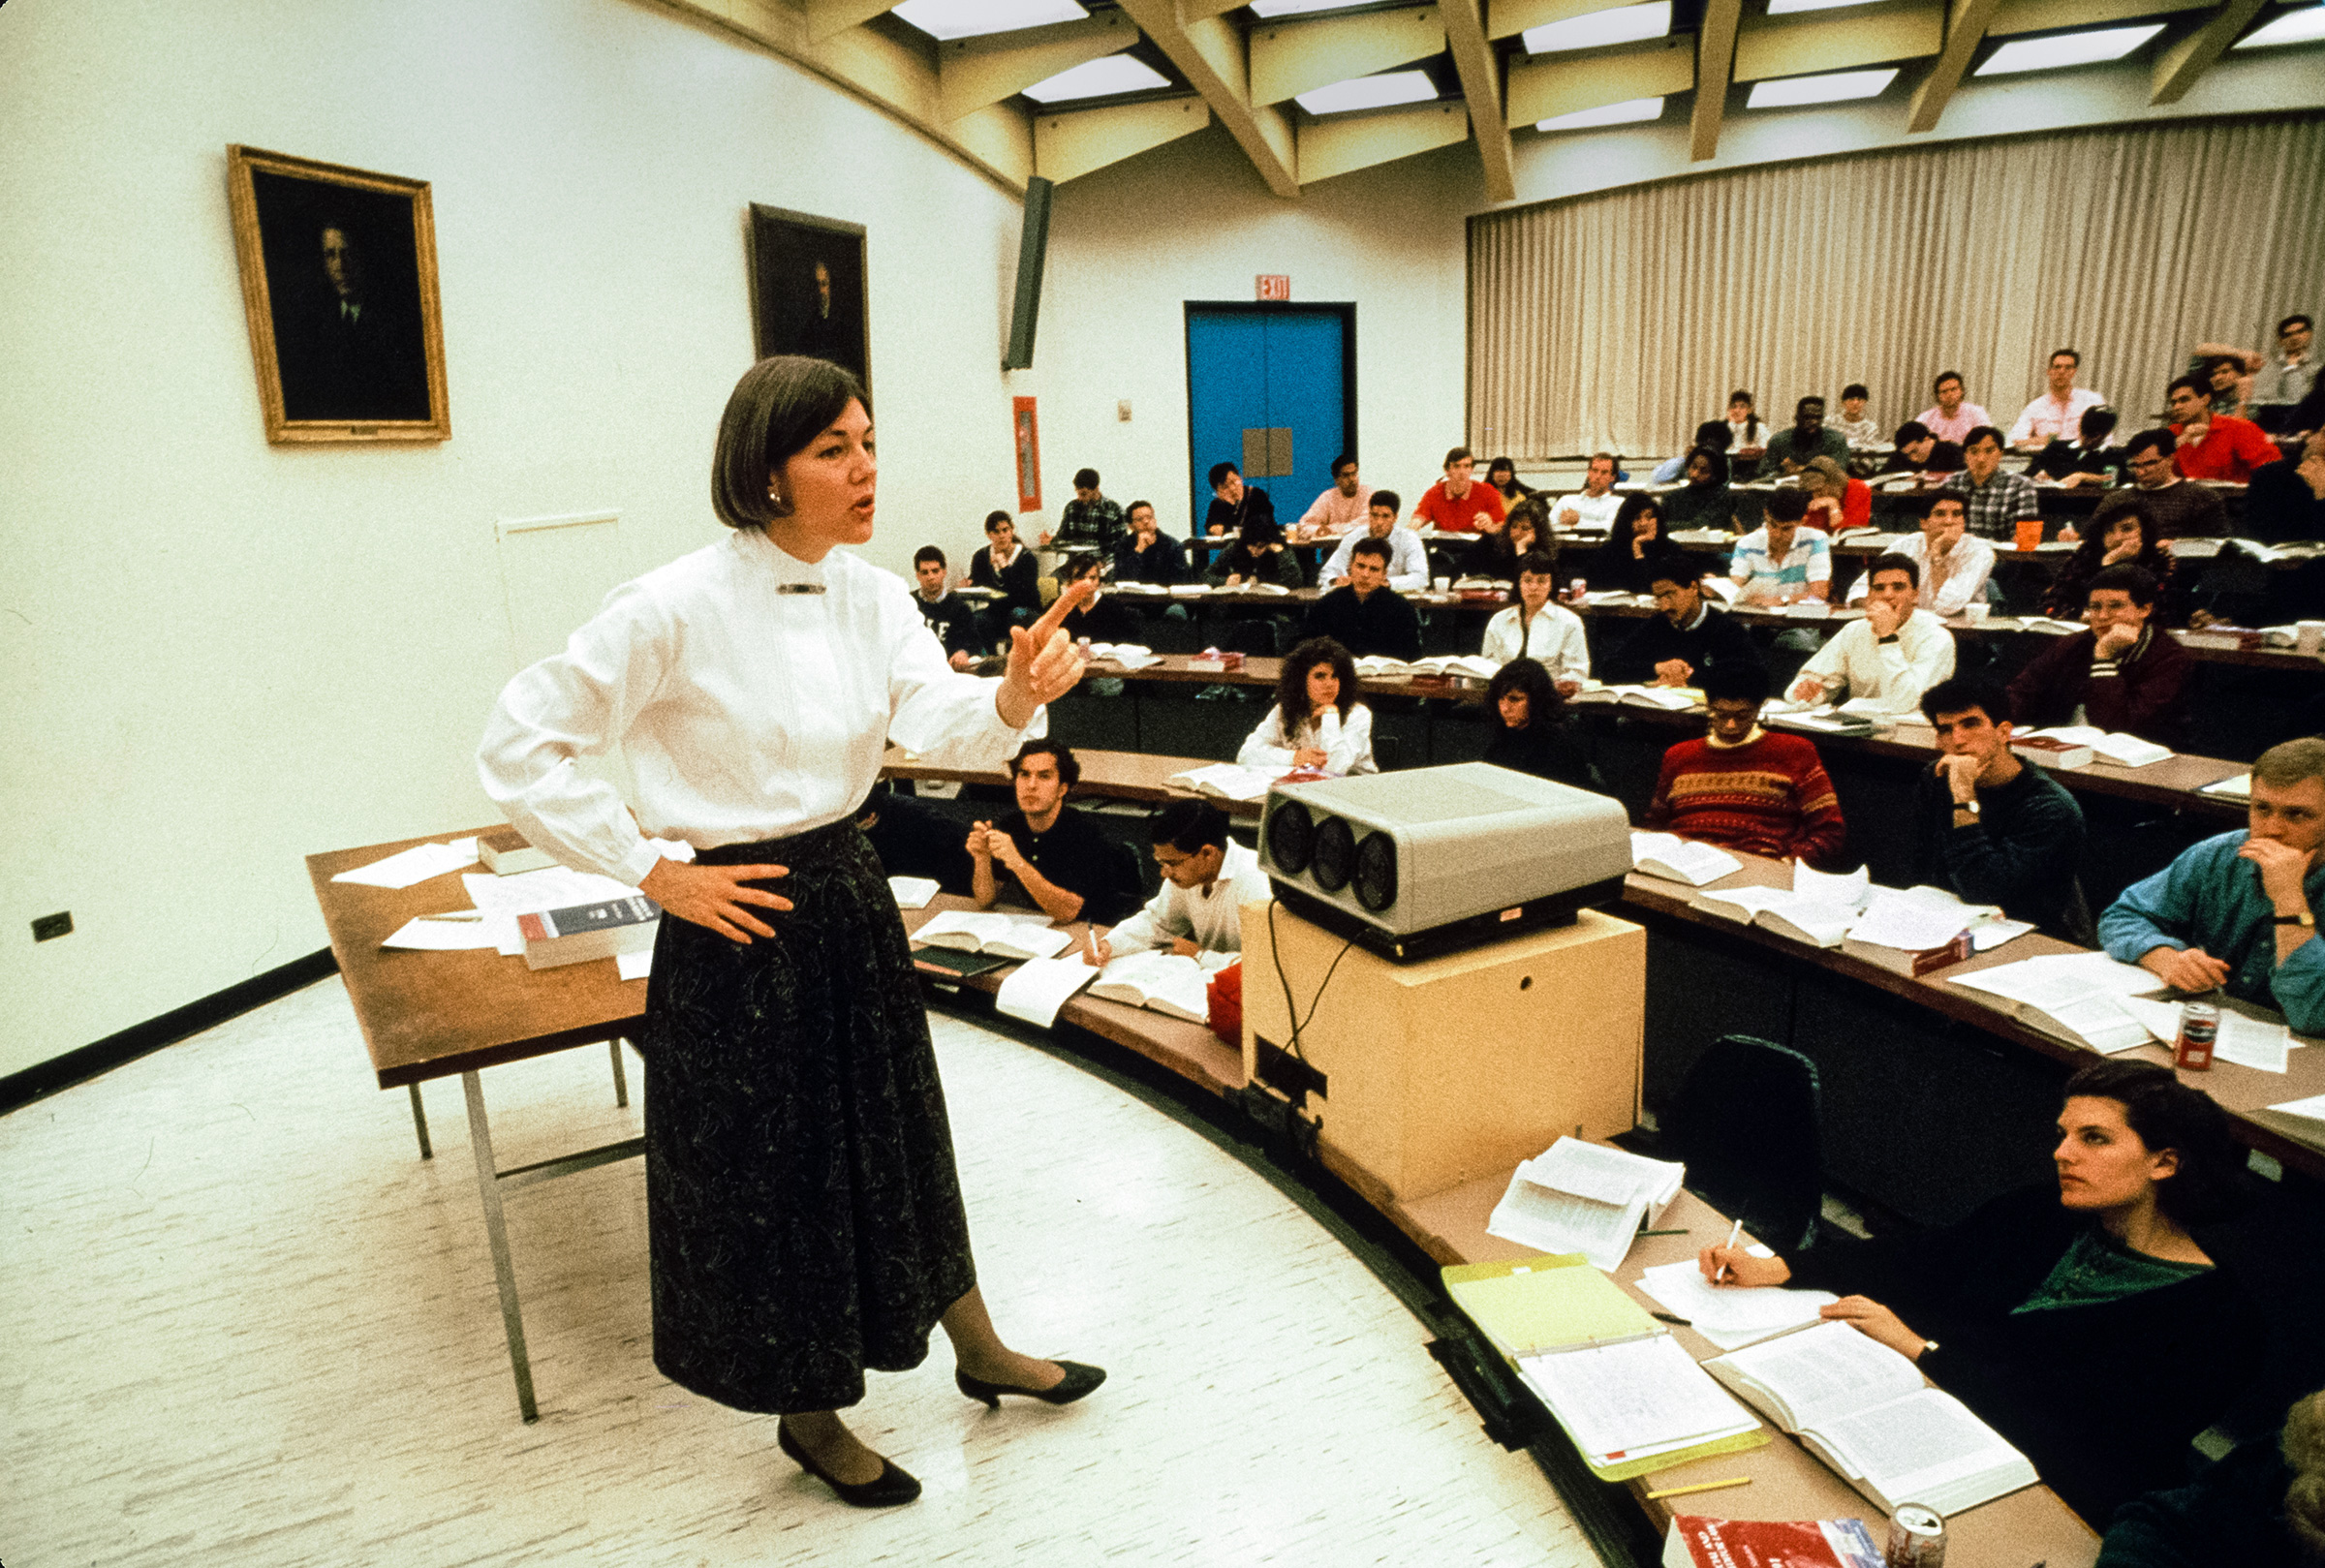 Warren teaching at the University of Pennsylvania Law School in Philadelphia in the early 1990s.